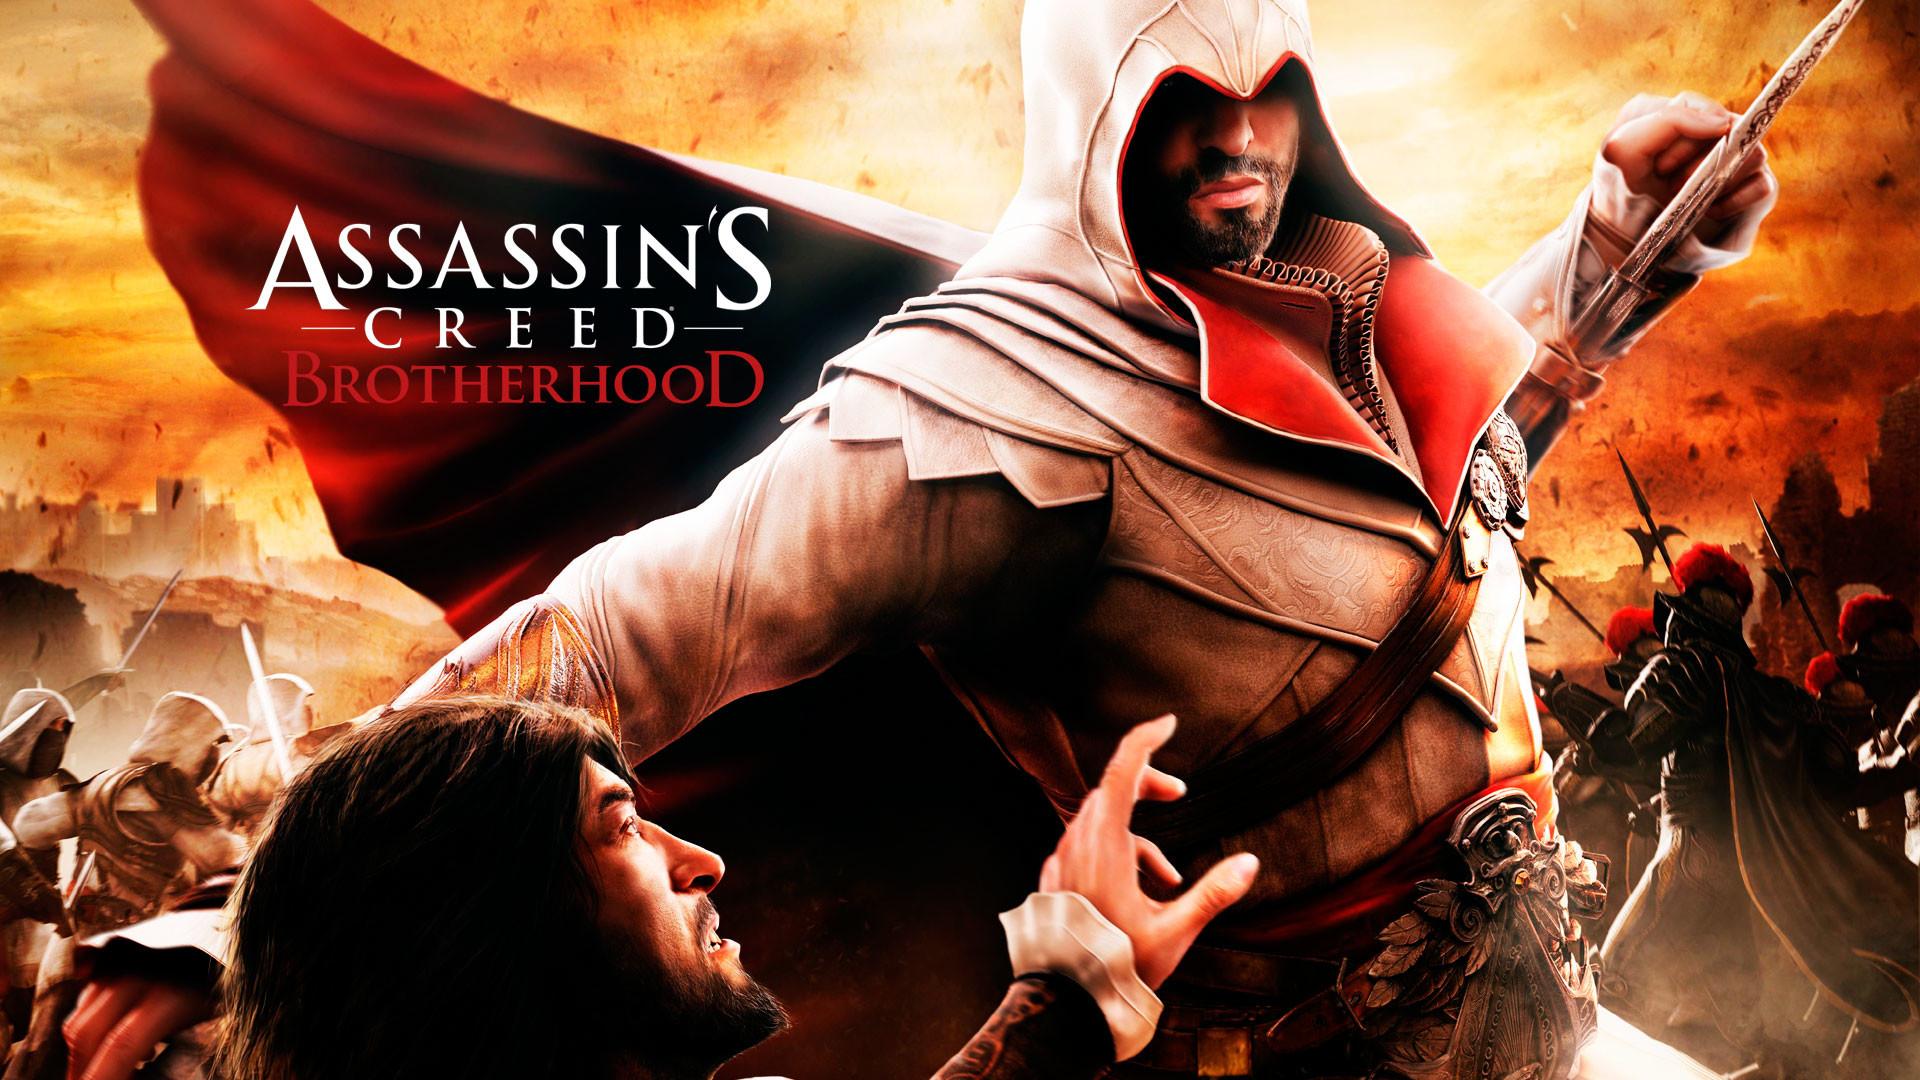 Assassins Creed Brotherhood Wallpaper (87+ images)Assassins Creed Brotherhood Wallpaper 1920x1080